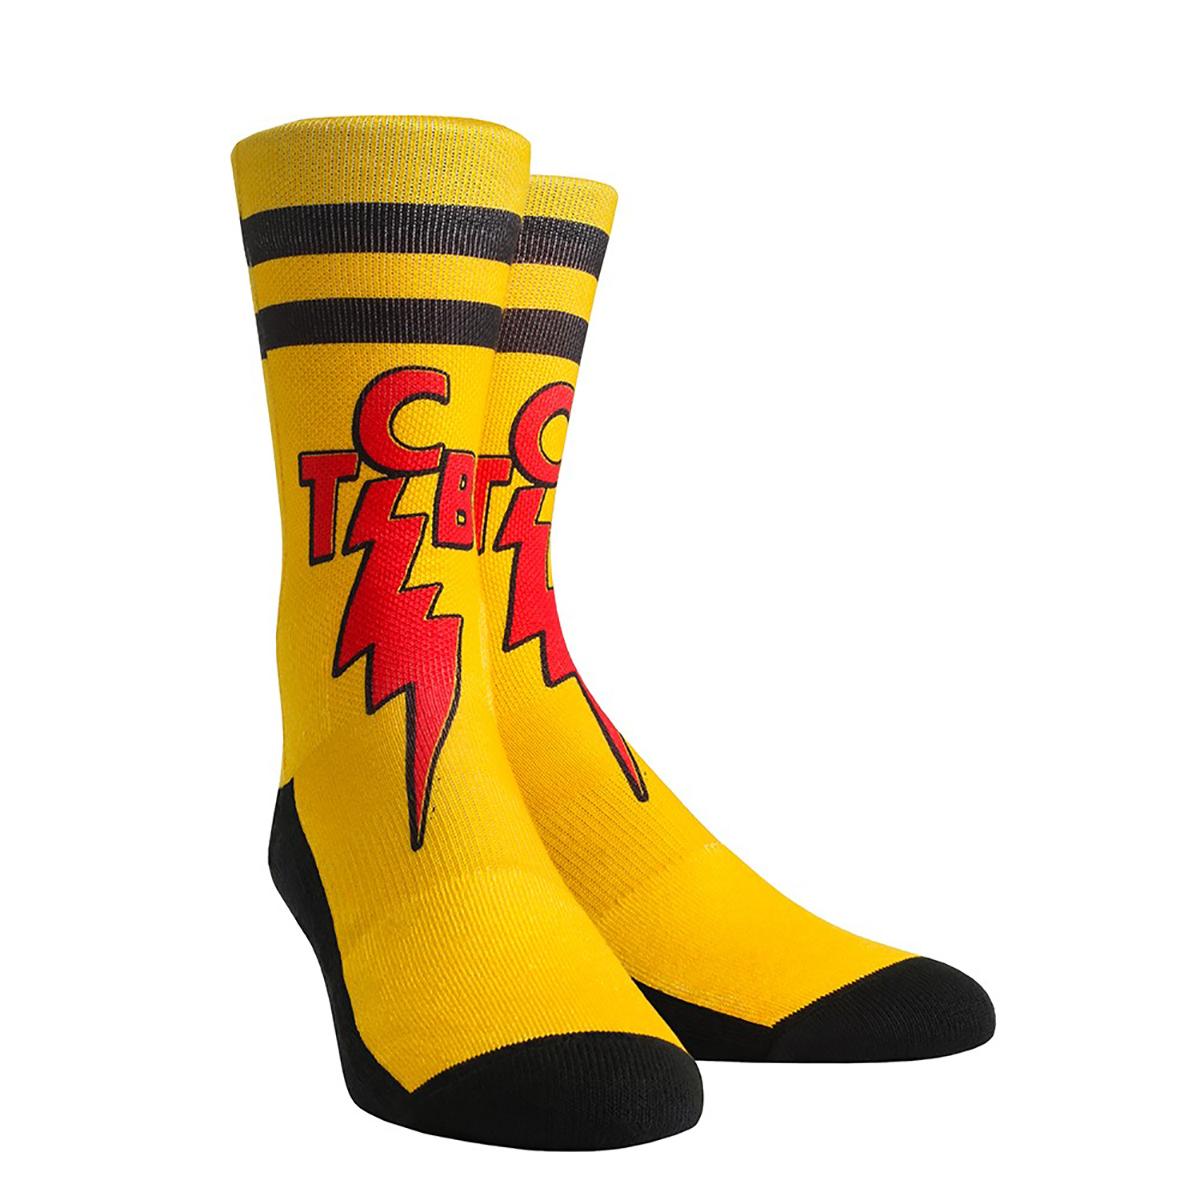 Elvis Presley TCB/Silhouette Socks - Adult